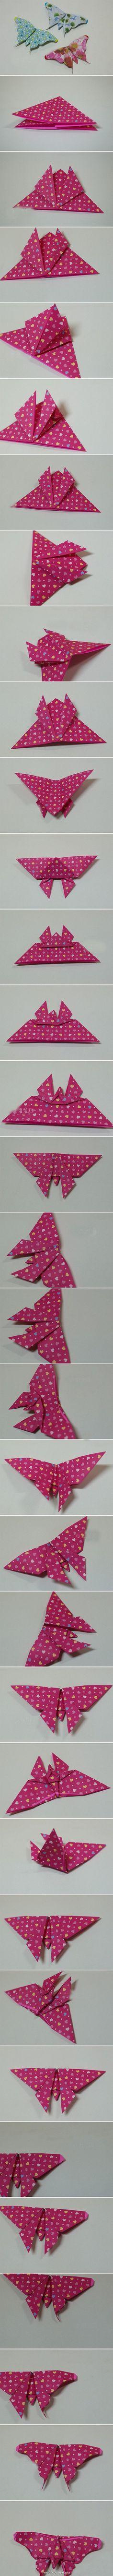 Oragami Butterfly